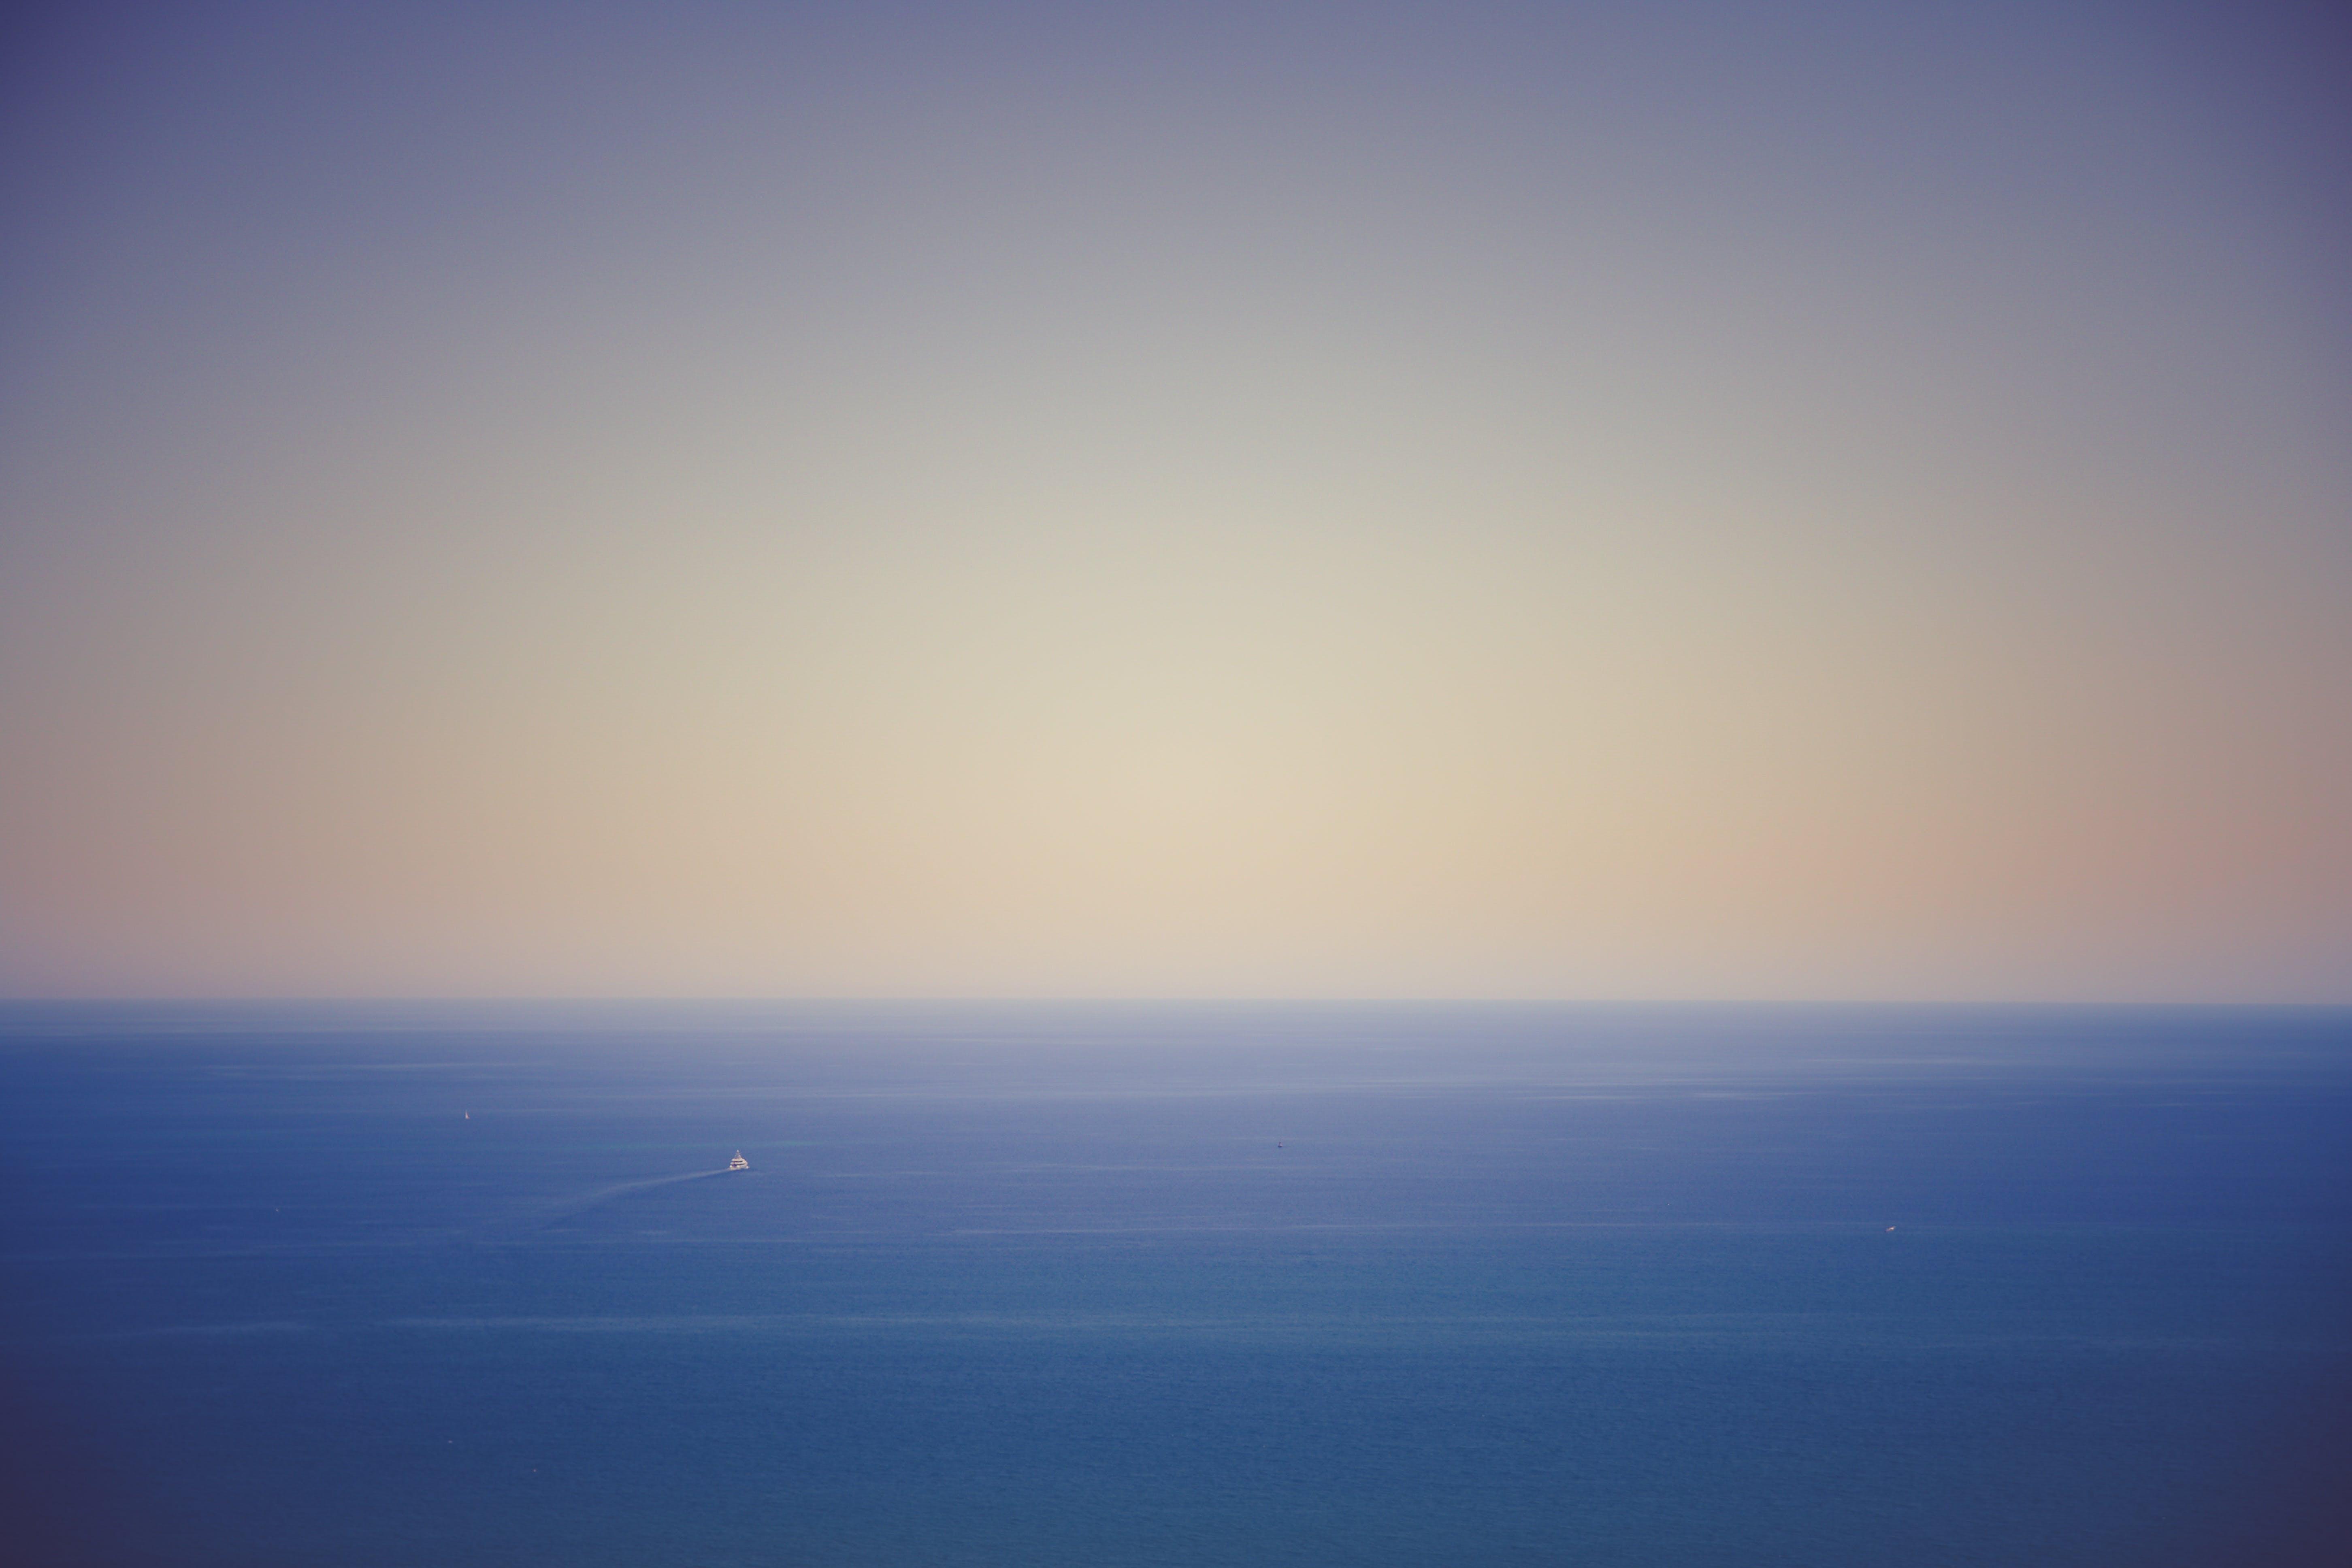 Free stock photo of sea, sky, water, boat